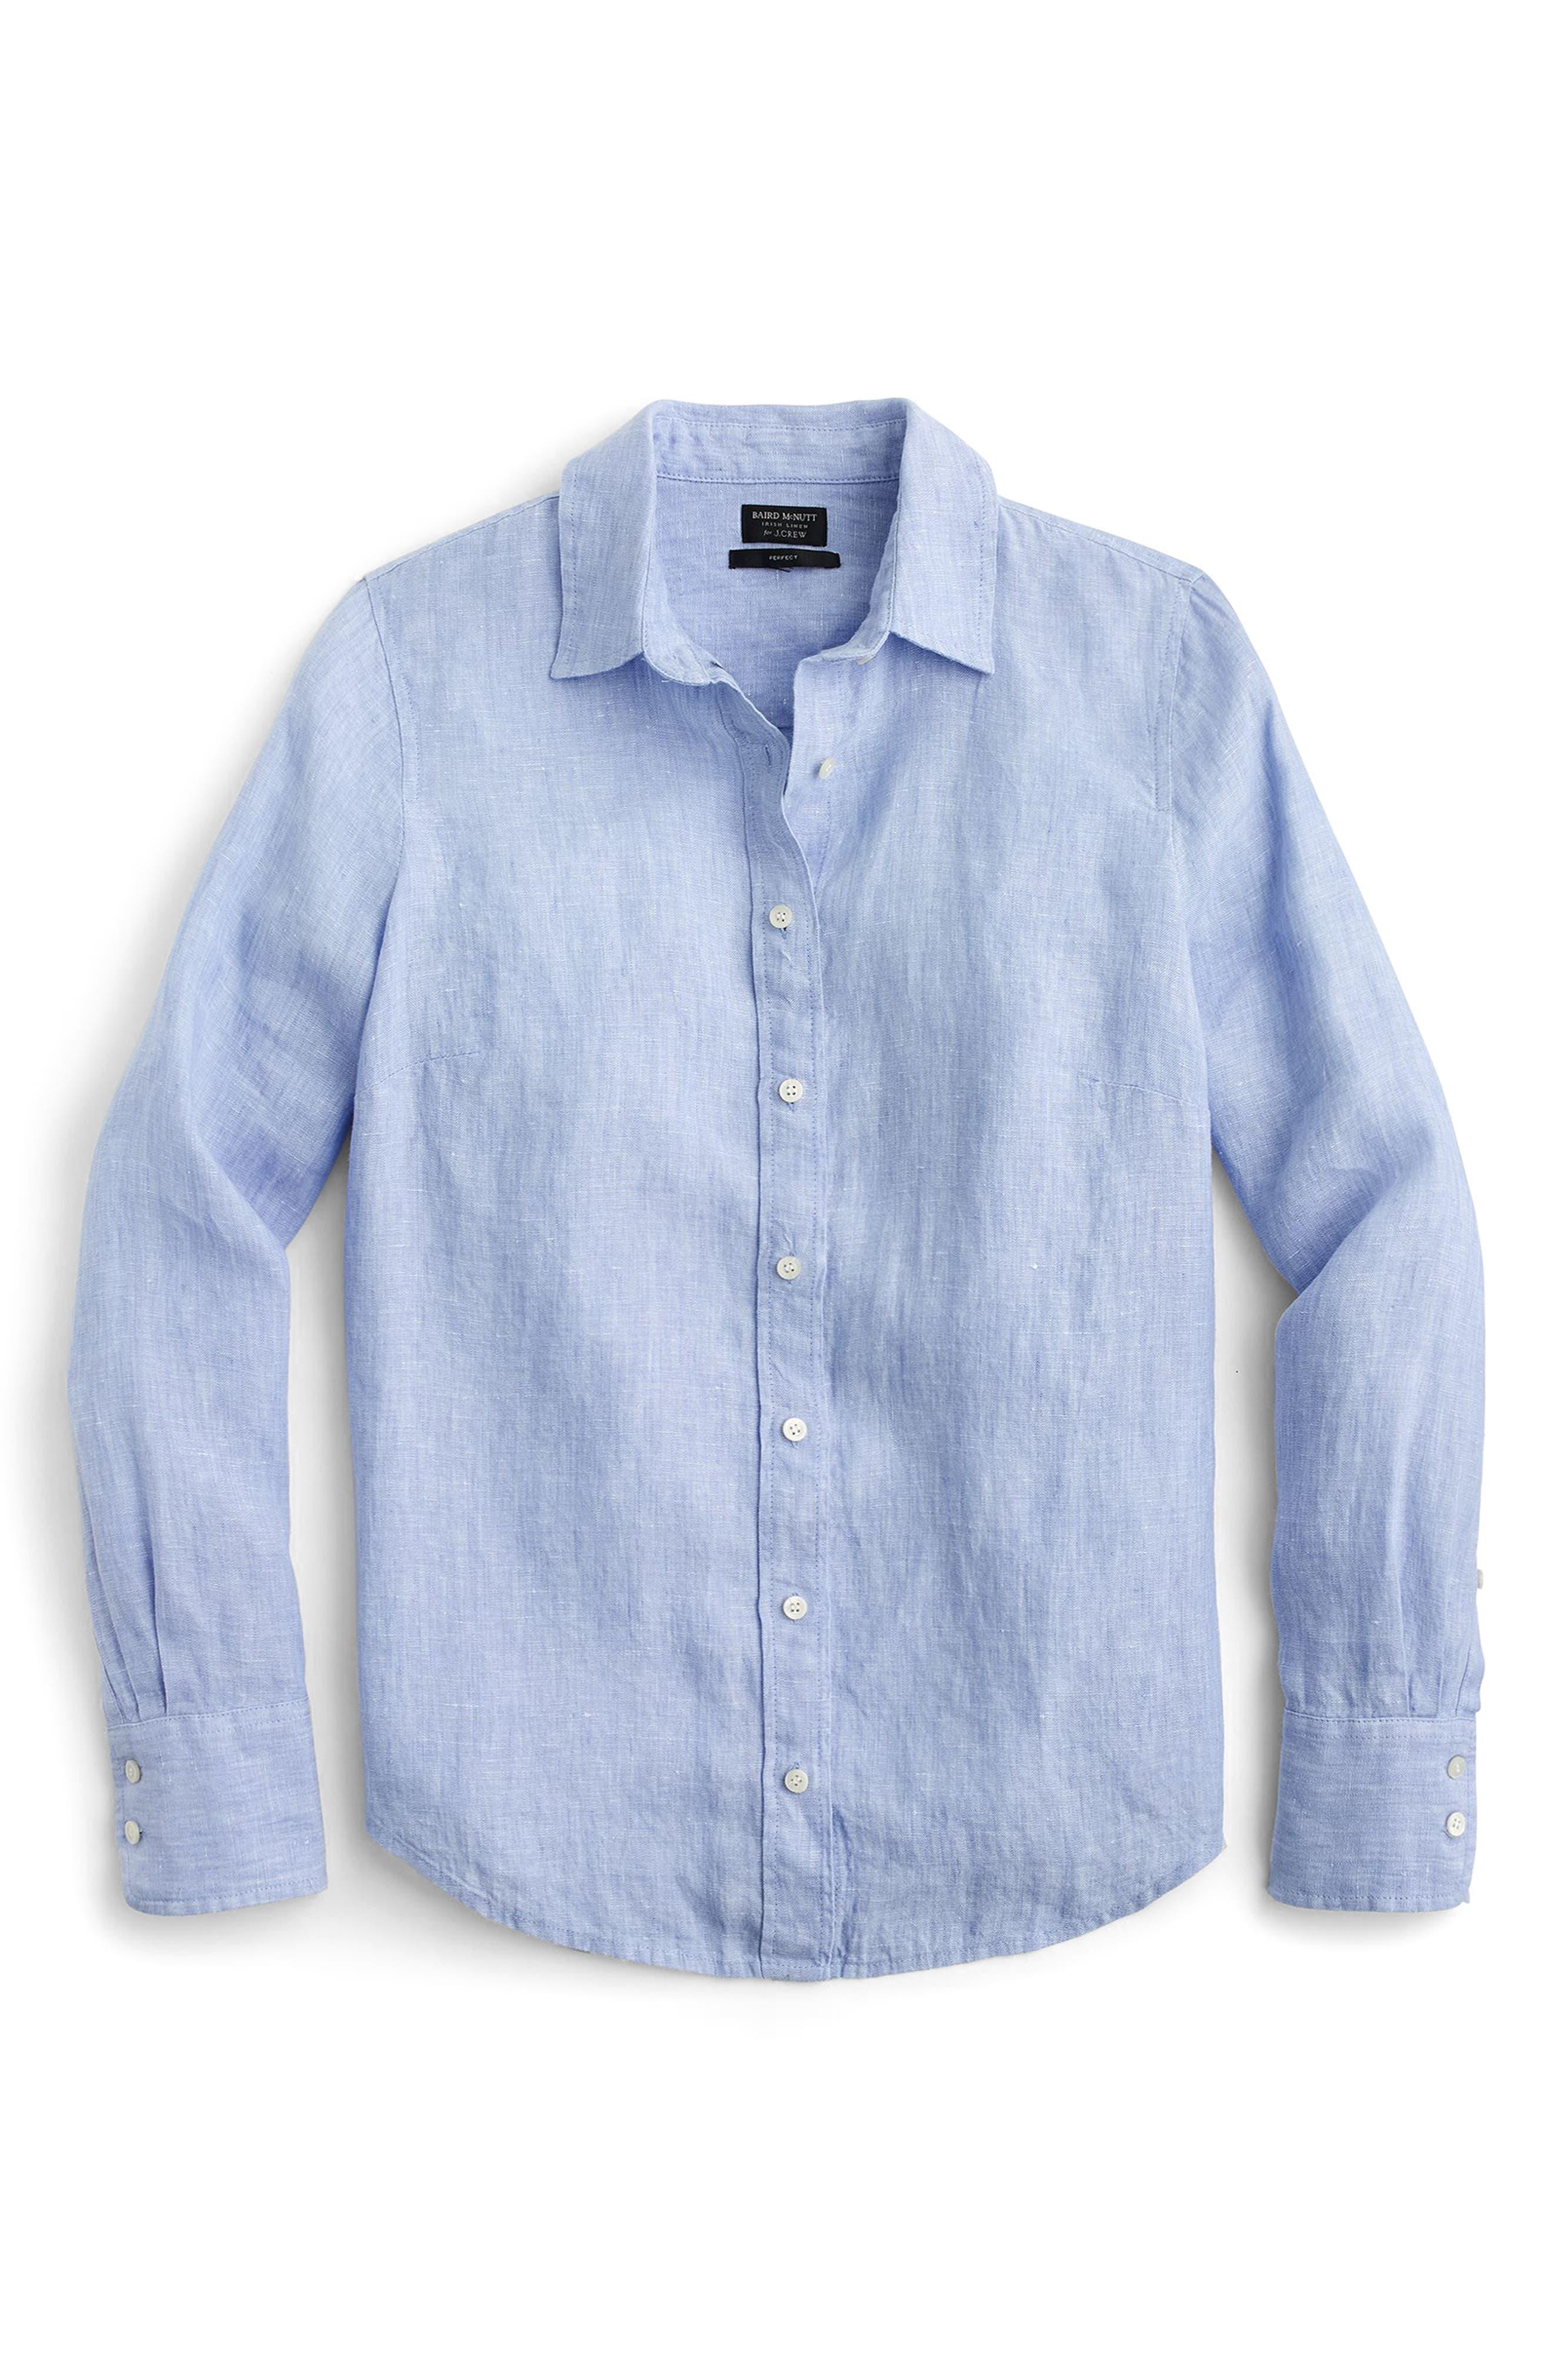 Slim Perfect Cross Dyed Irish Linen Shirt,                             Alternate thumbnail 2, color,                             402